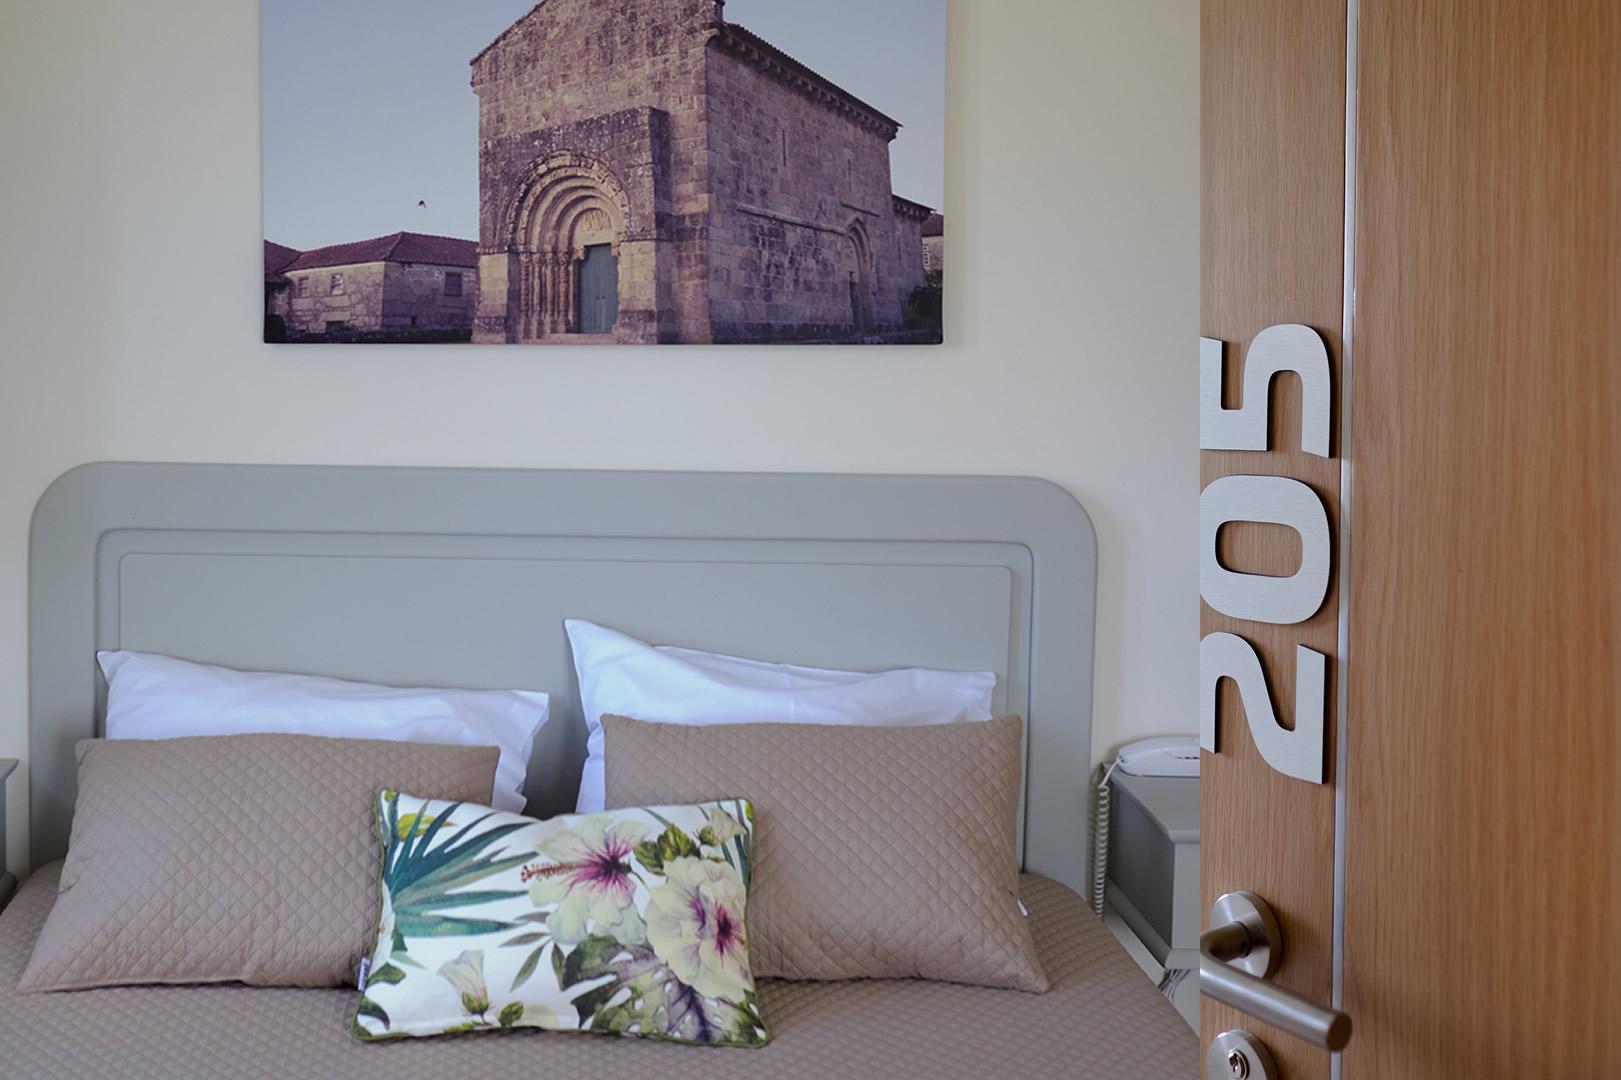 http://www.hotelospoetas.com/wp-content/uploads/2018/03/2211CPAA3185_6_7_tonemapped.jpg